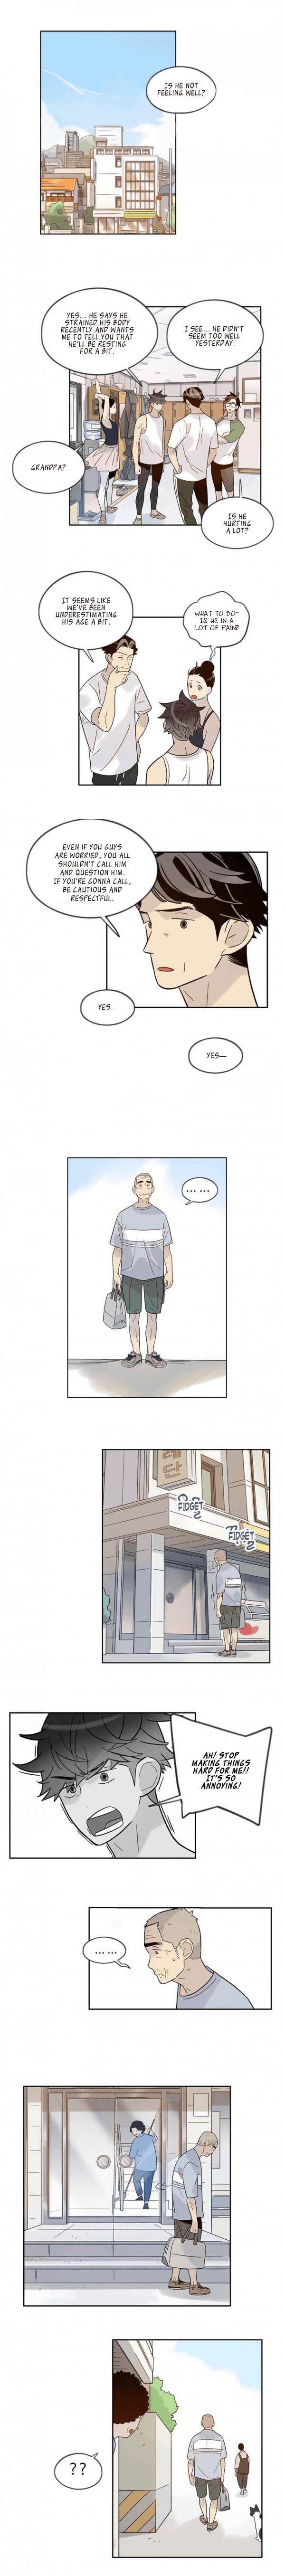 Manga Like a Butterfly - Chapter 41 Page 7